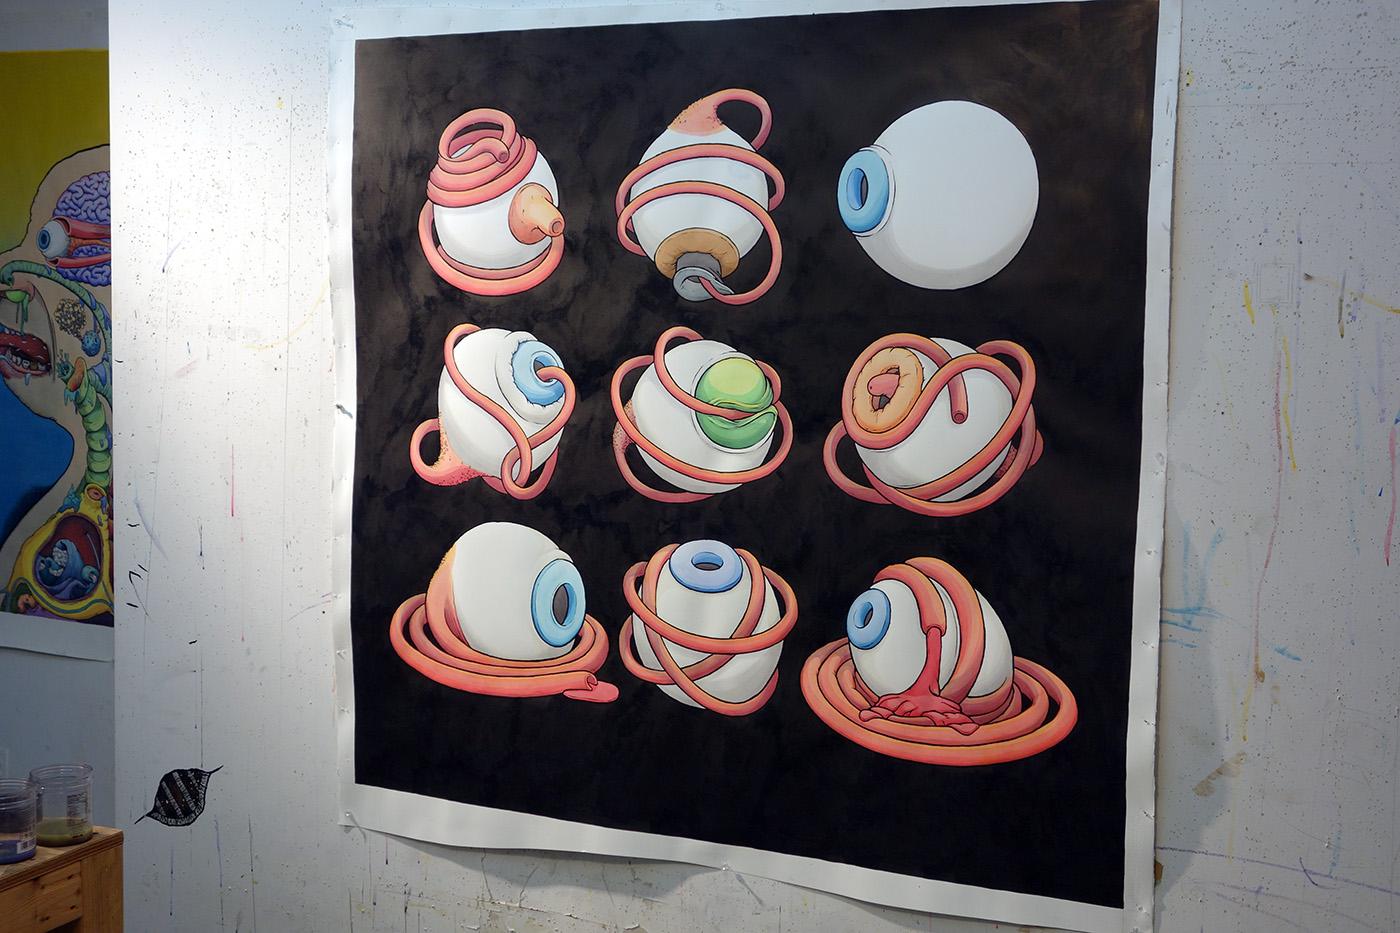 blackeyes_wall.jpg